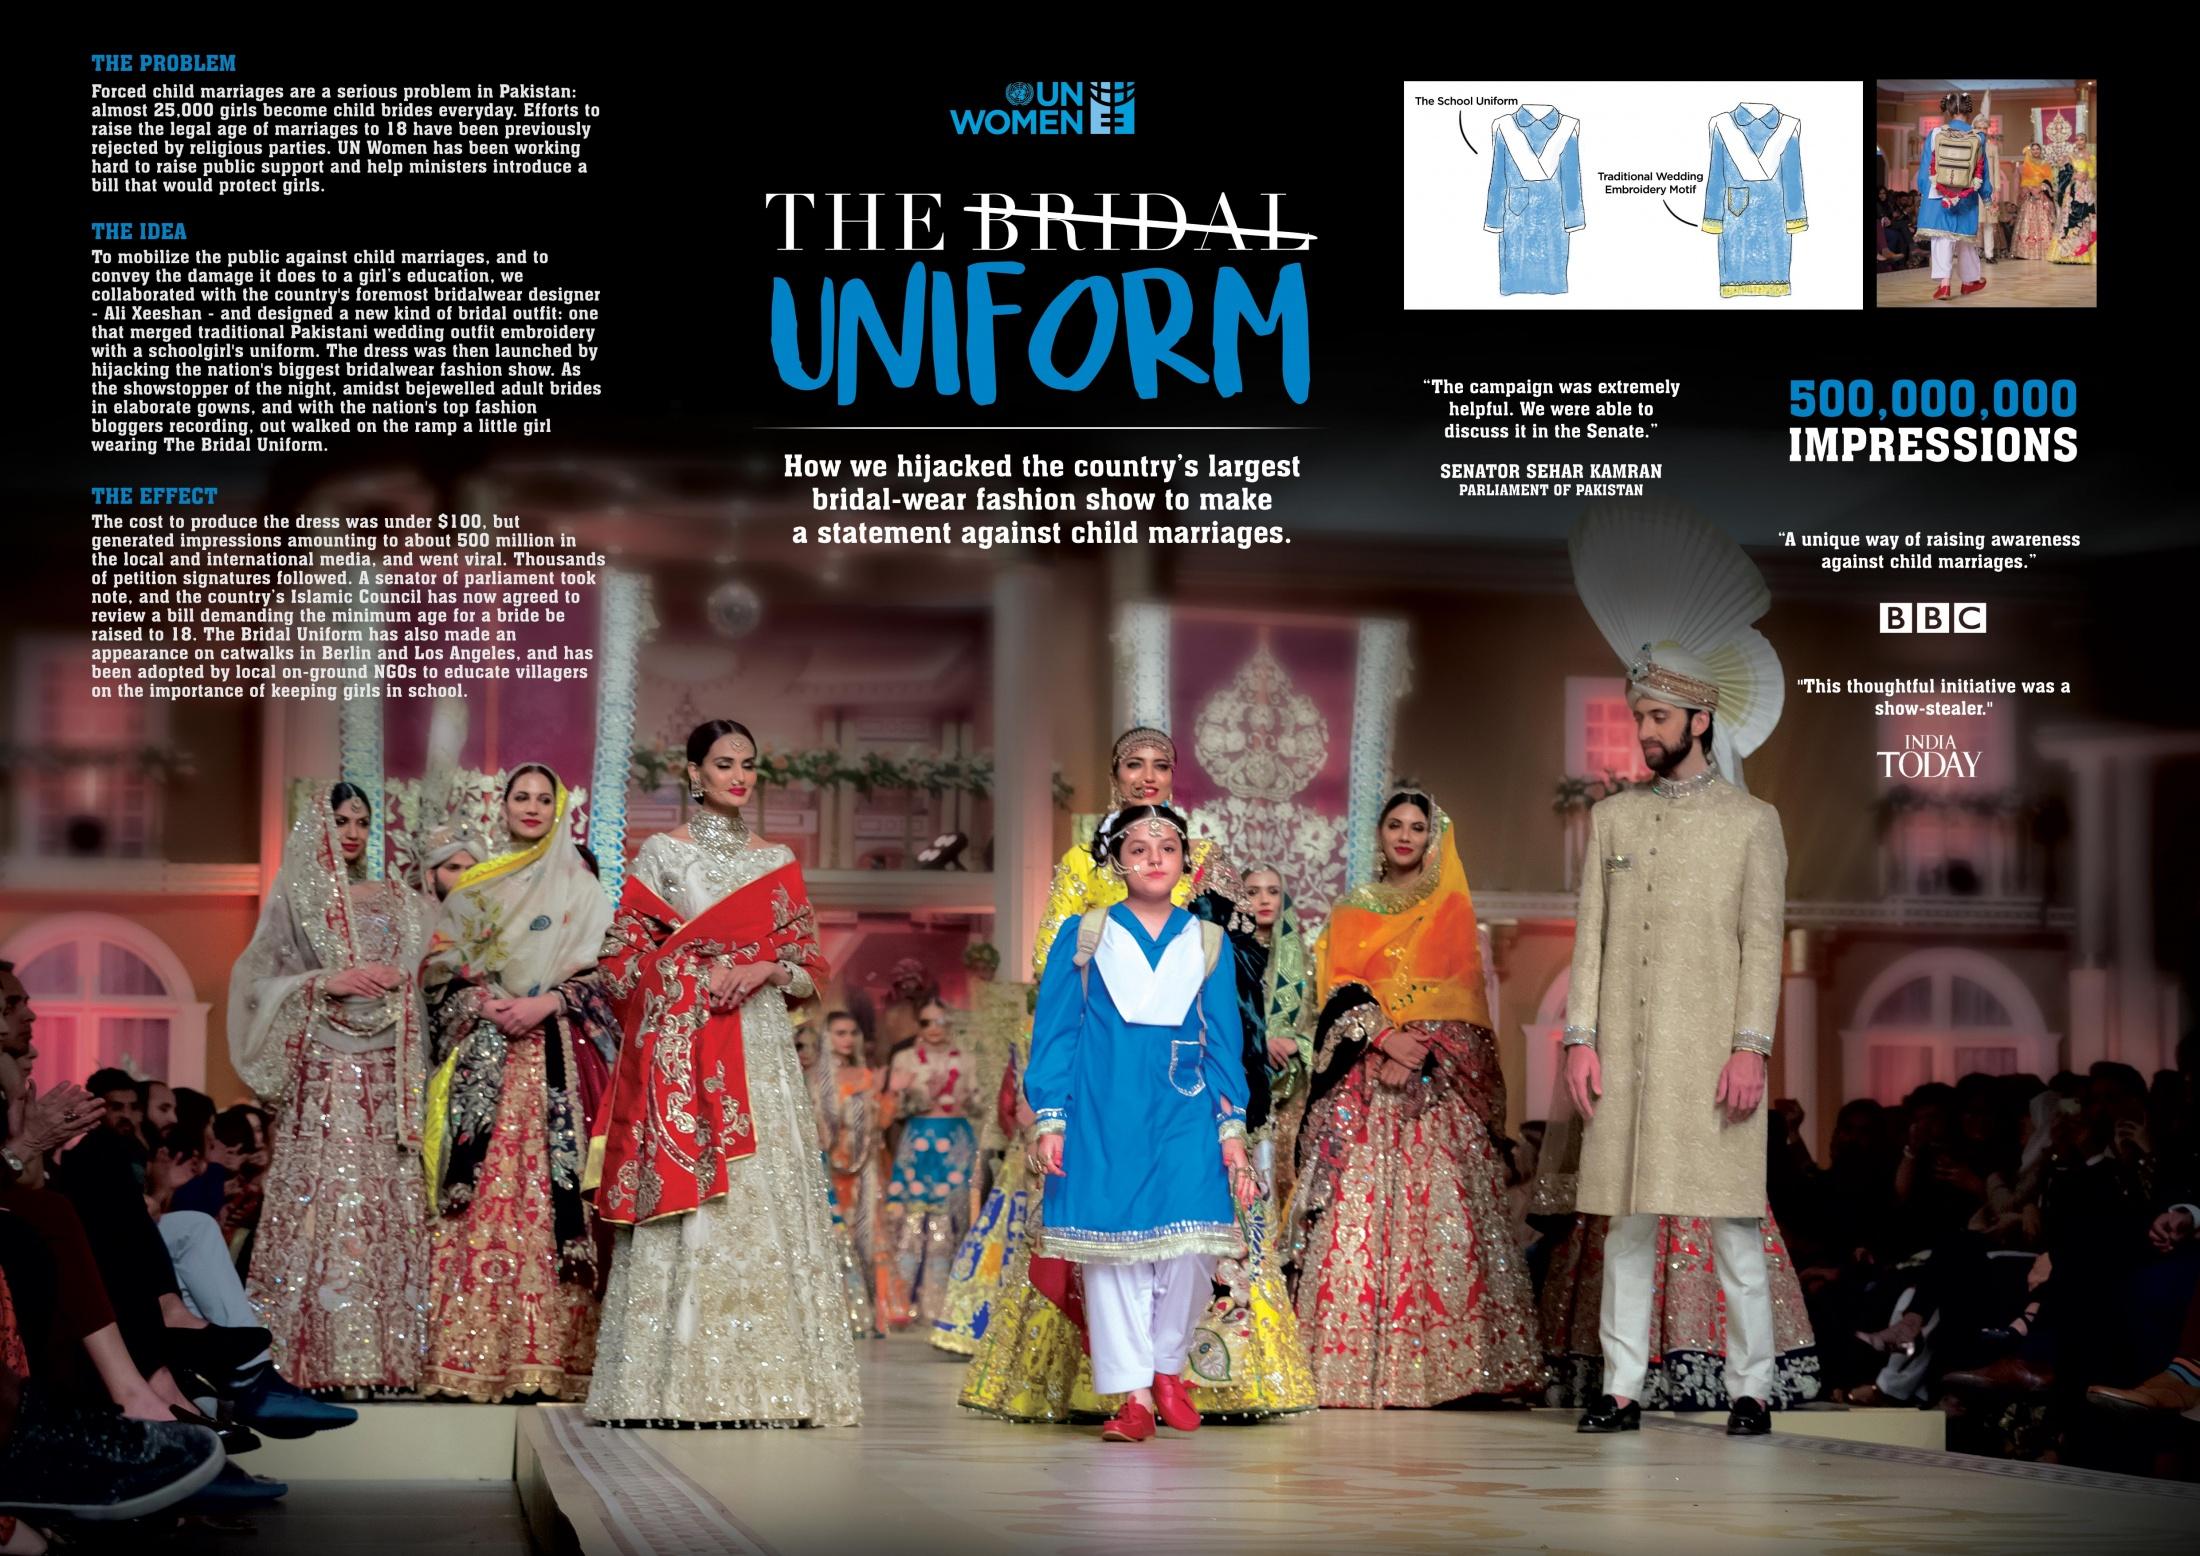 Thumbnail for The Bridal Uniform